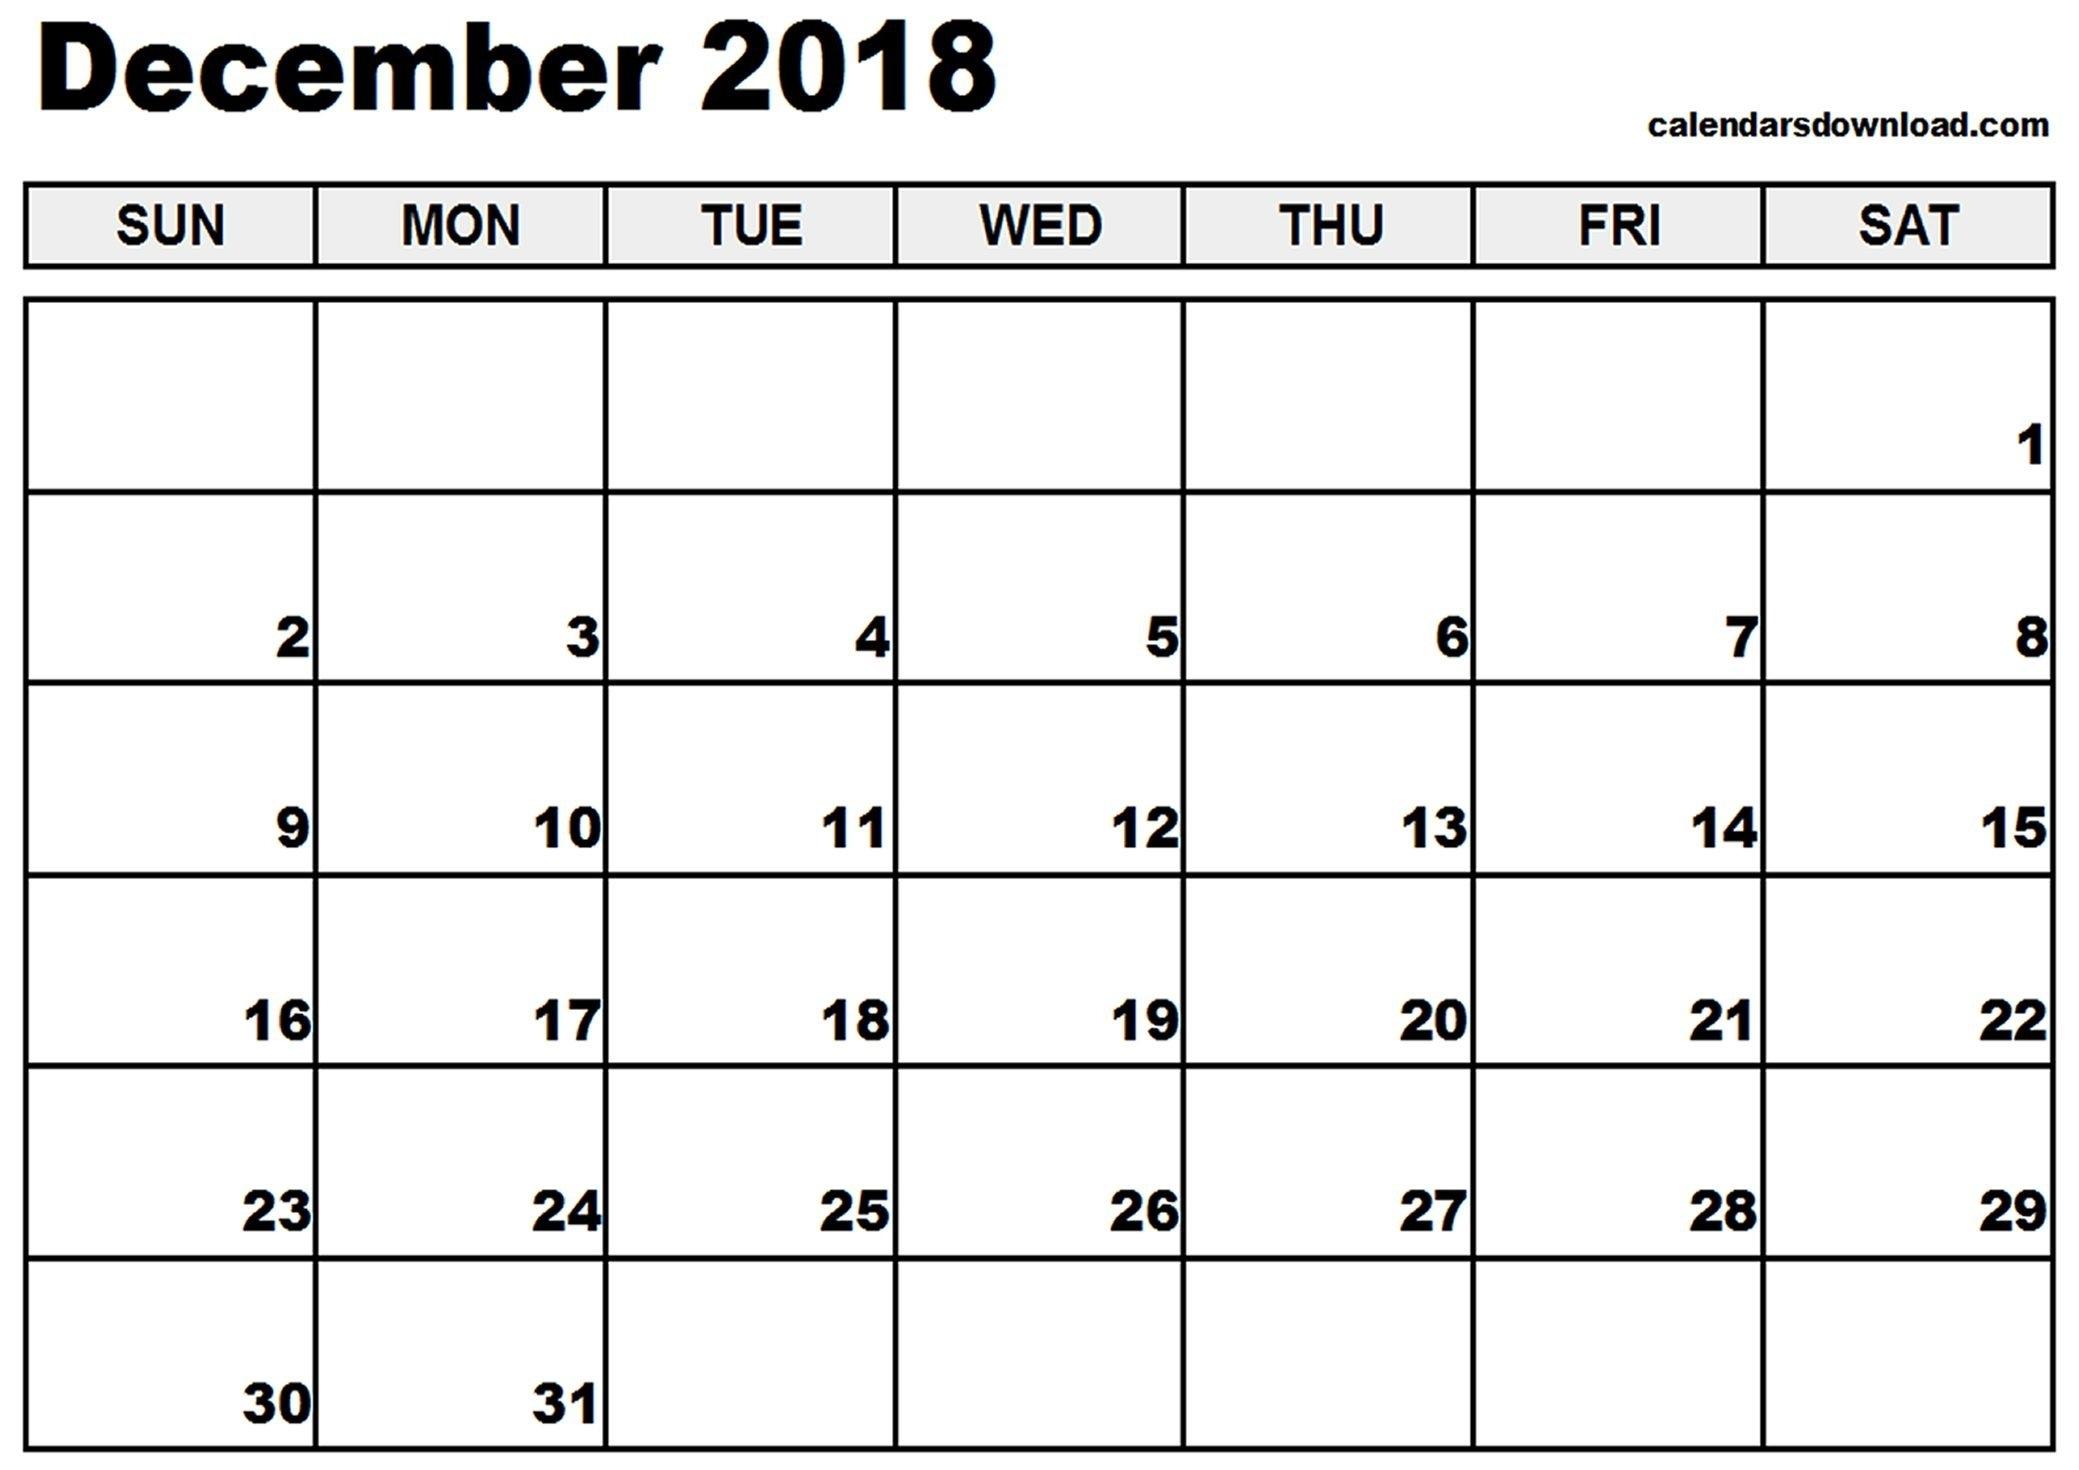 December 2018 Calendar Canada Pdf - Printable Calendar 2019| Blank Calendar Of 2019 Canada